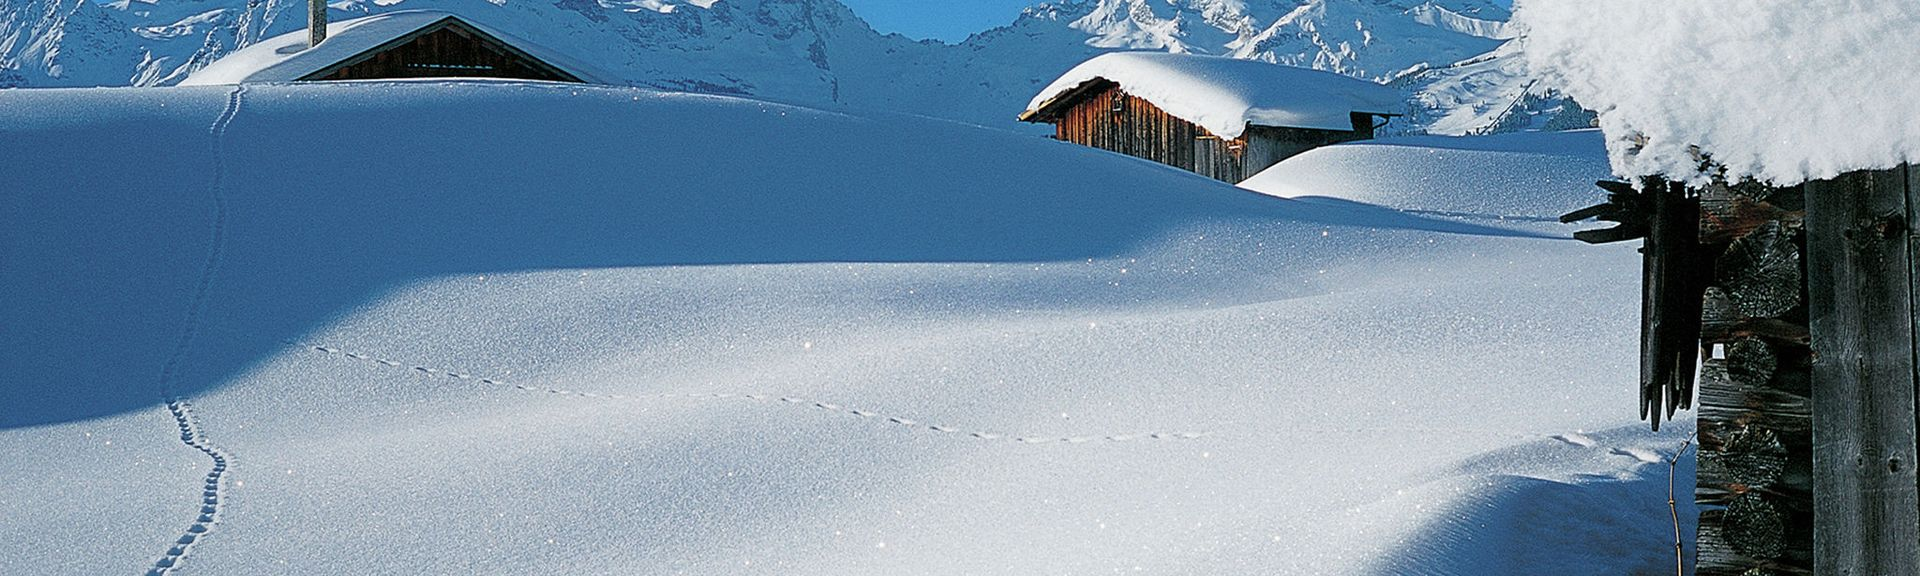 Fraxern, Austria